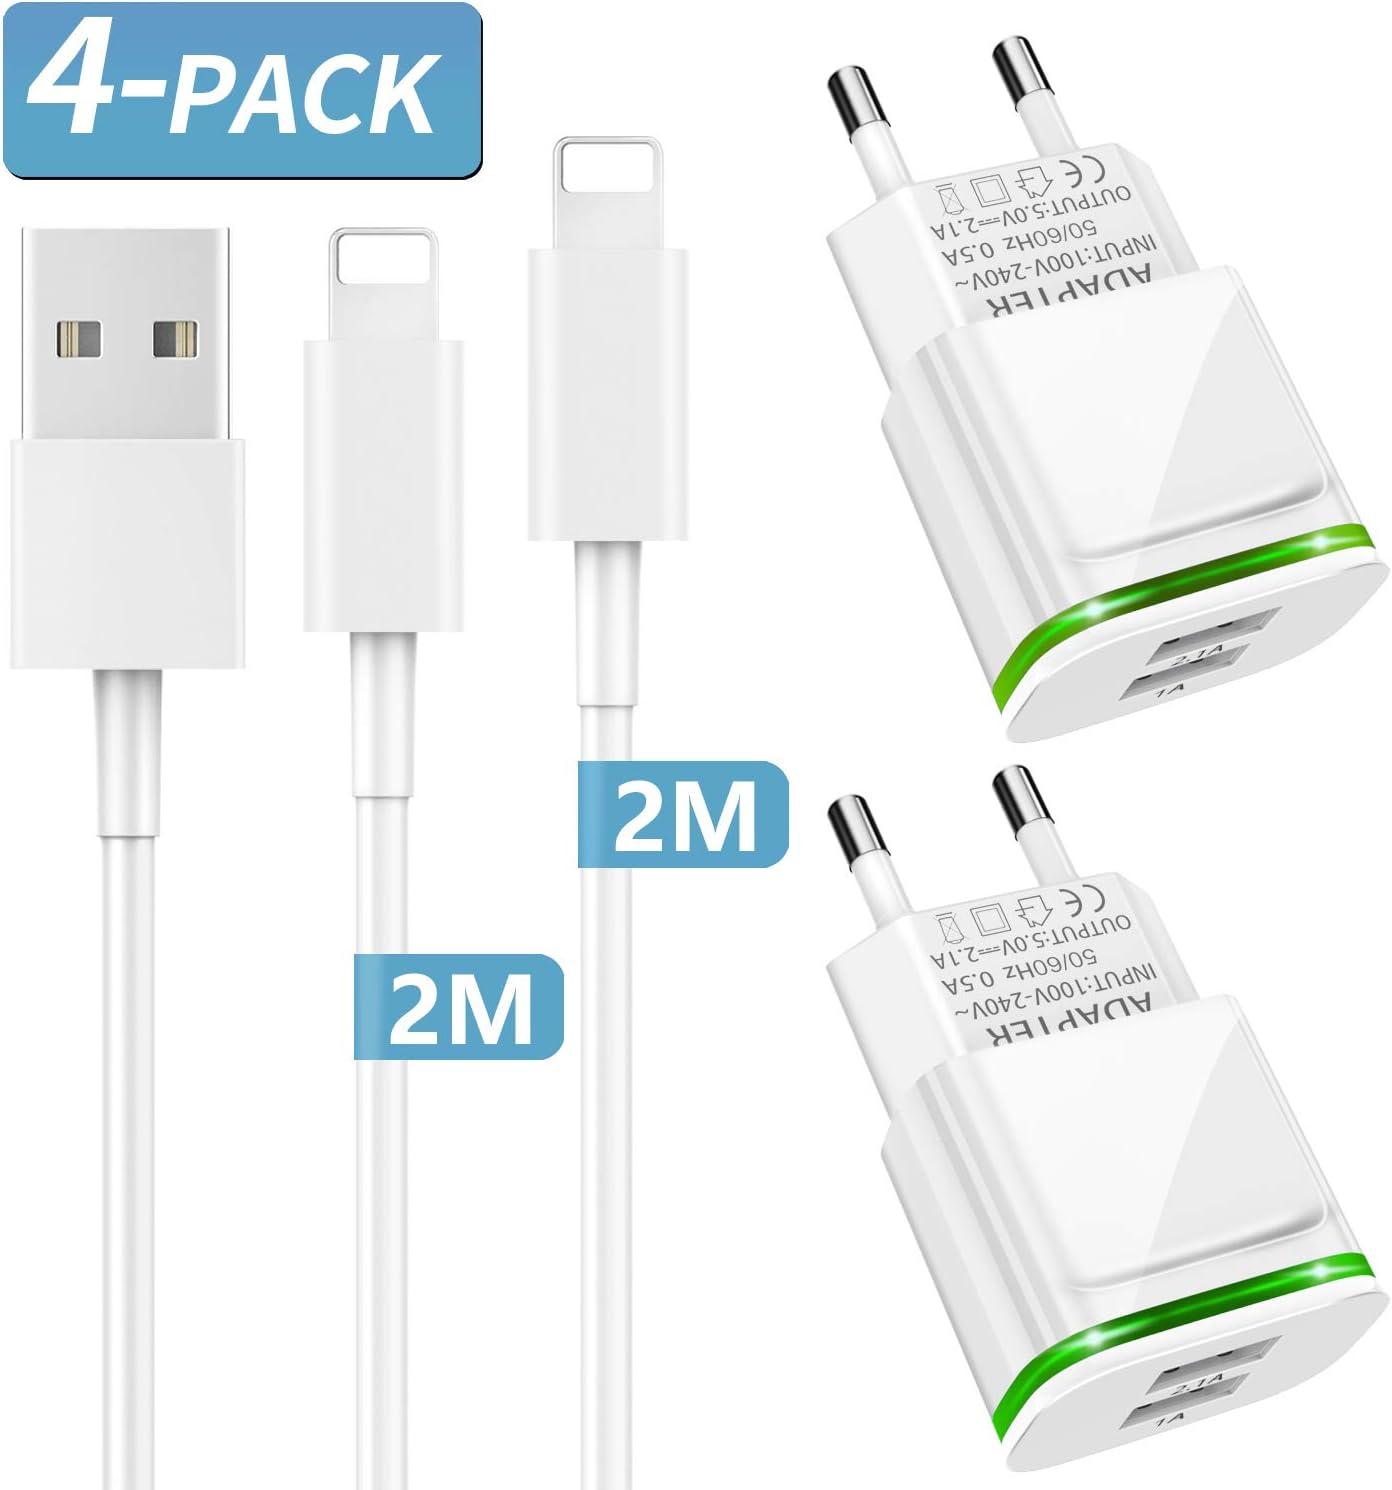 PICILOO Cargador Phone, 4-Pack 2M Cable + Dos Enchufe USB 2.1A/5V Movil Adaptador Compatible con iPhone 11 XS XS MAX/XR/X 8/7/6/6S Plus 5S/SE/5C, Pad Air Mini Pro, Pod: Amazon.es: Electrónica